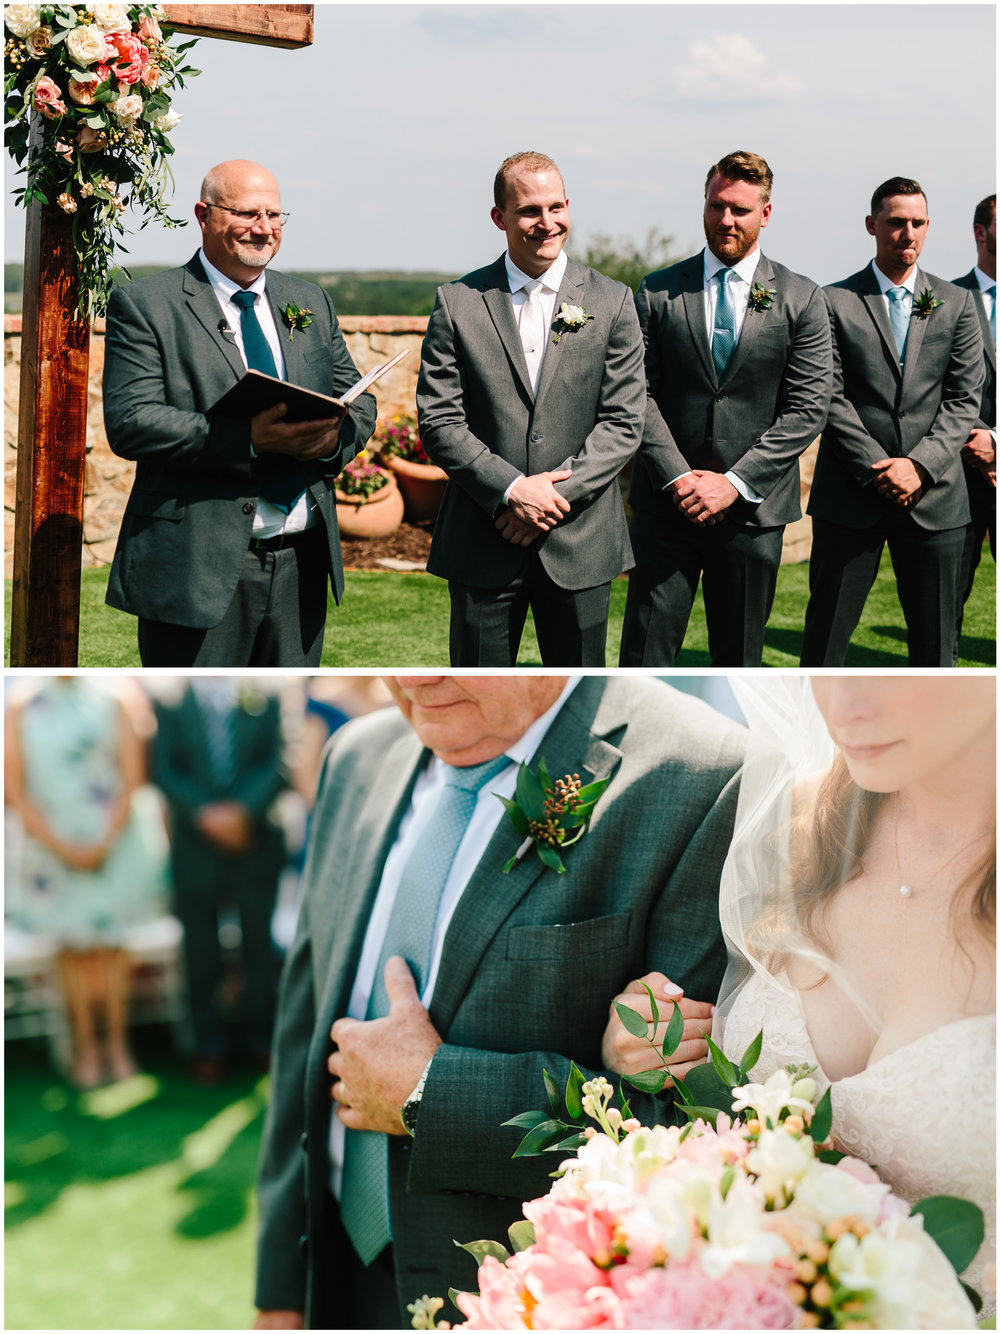 bella_collina_wedding_38.jpg